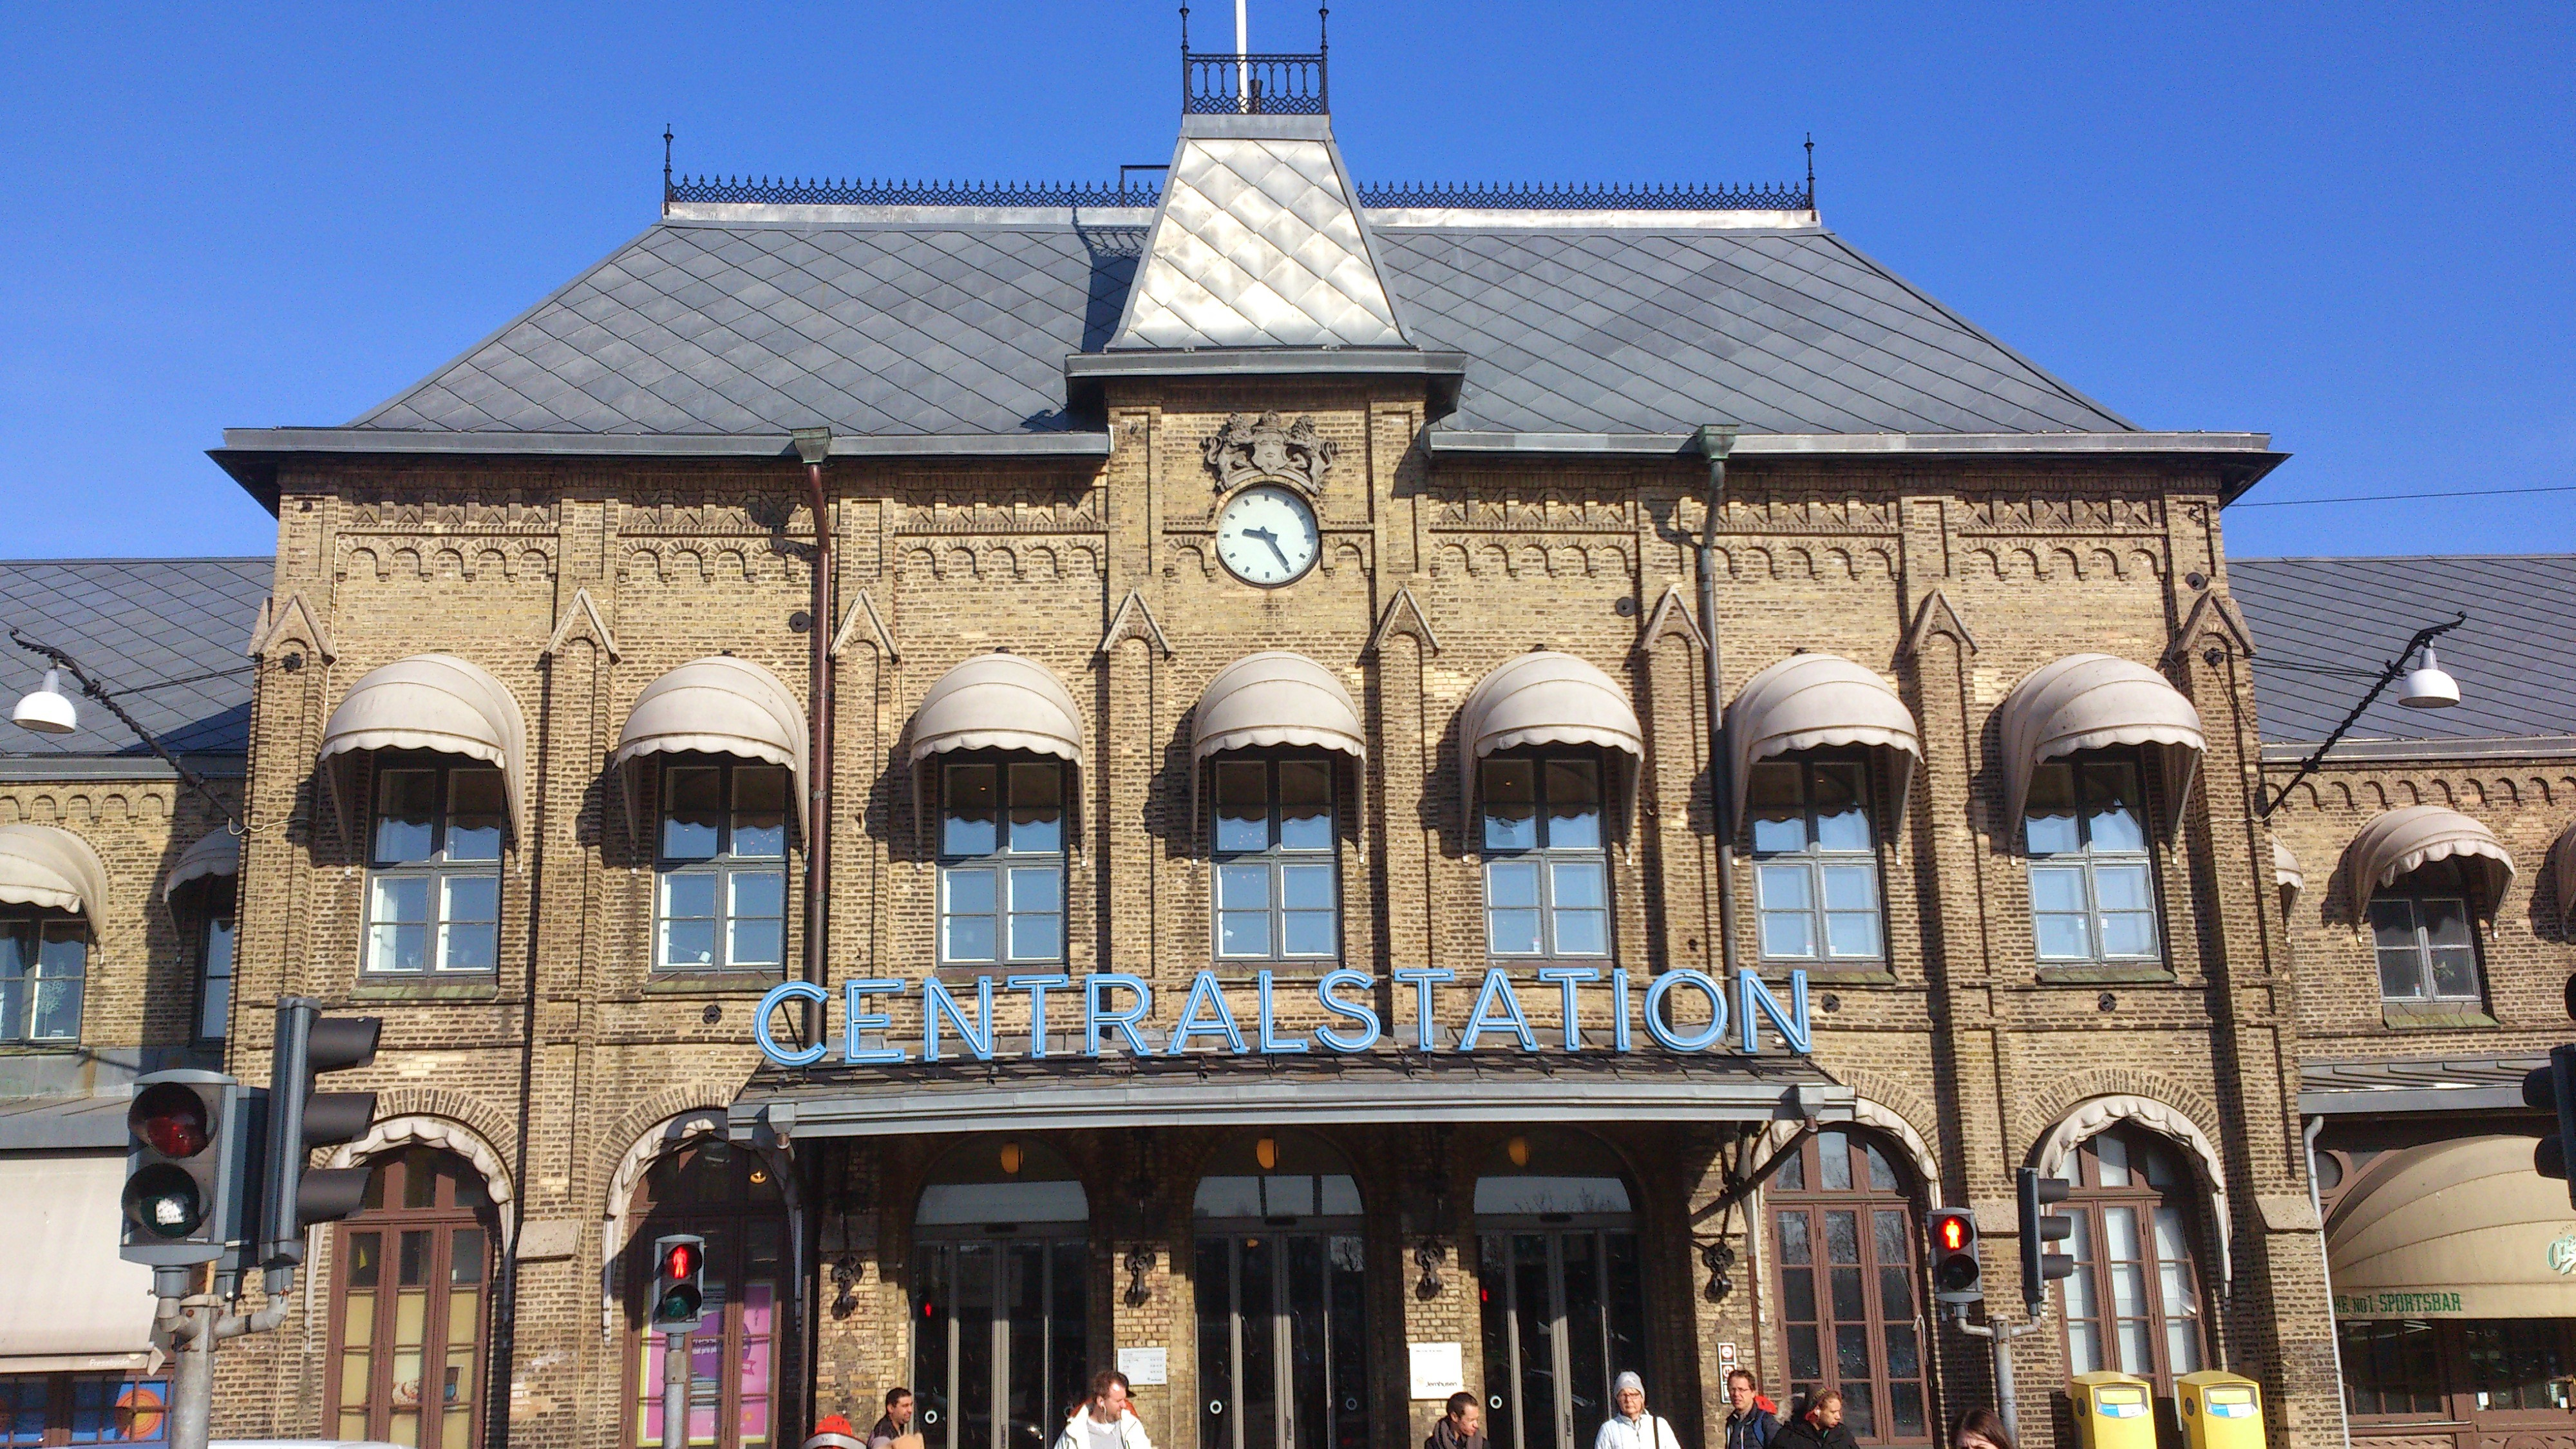 Gothenburg Train Station